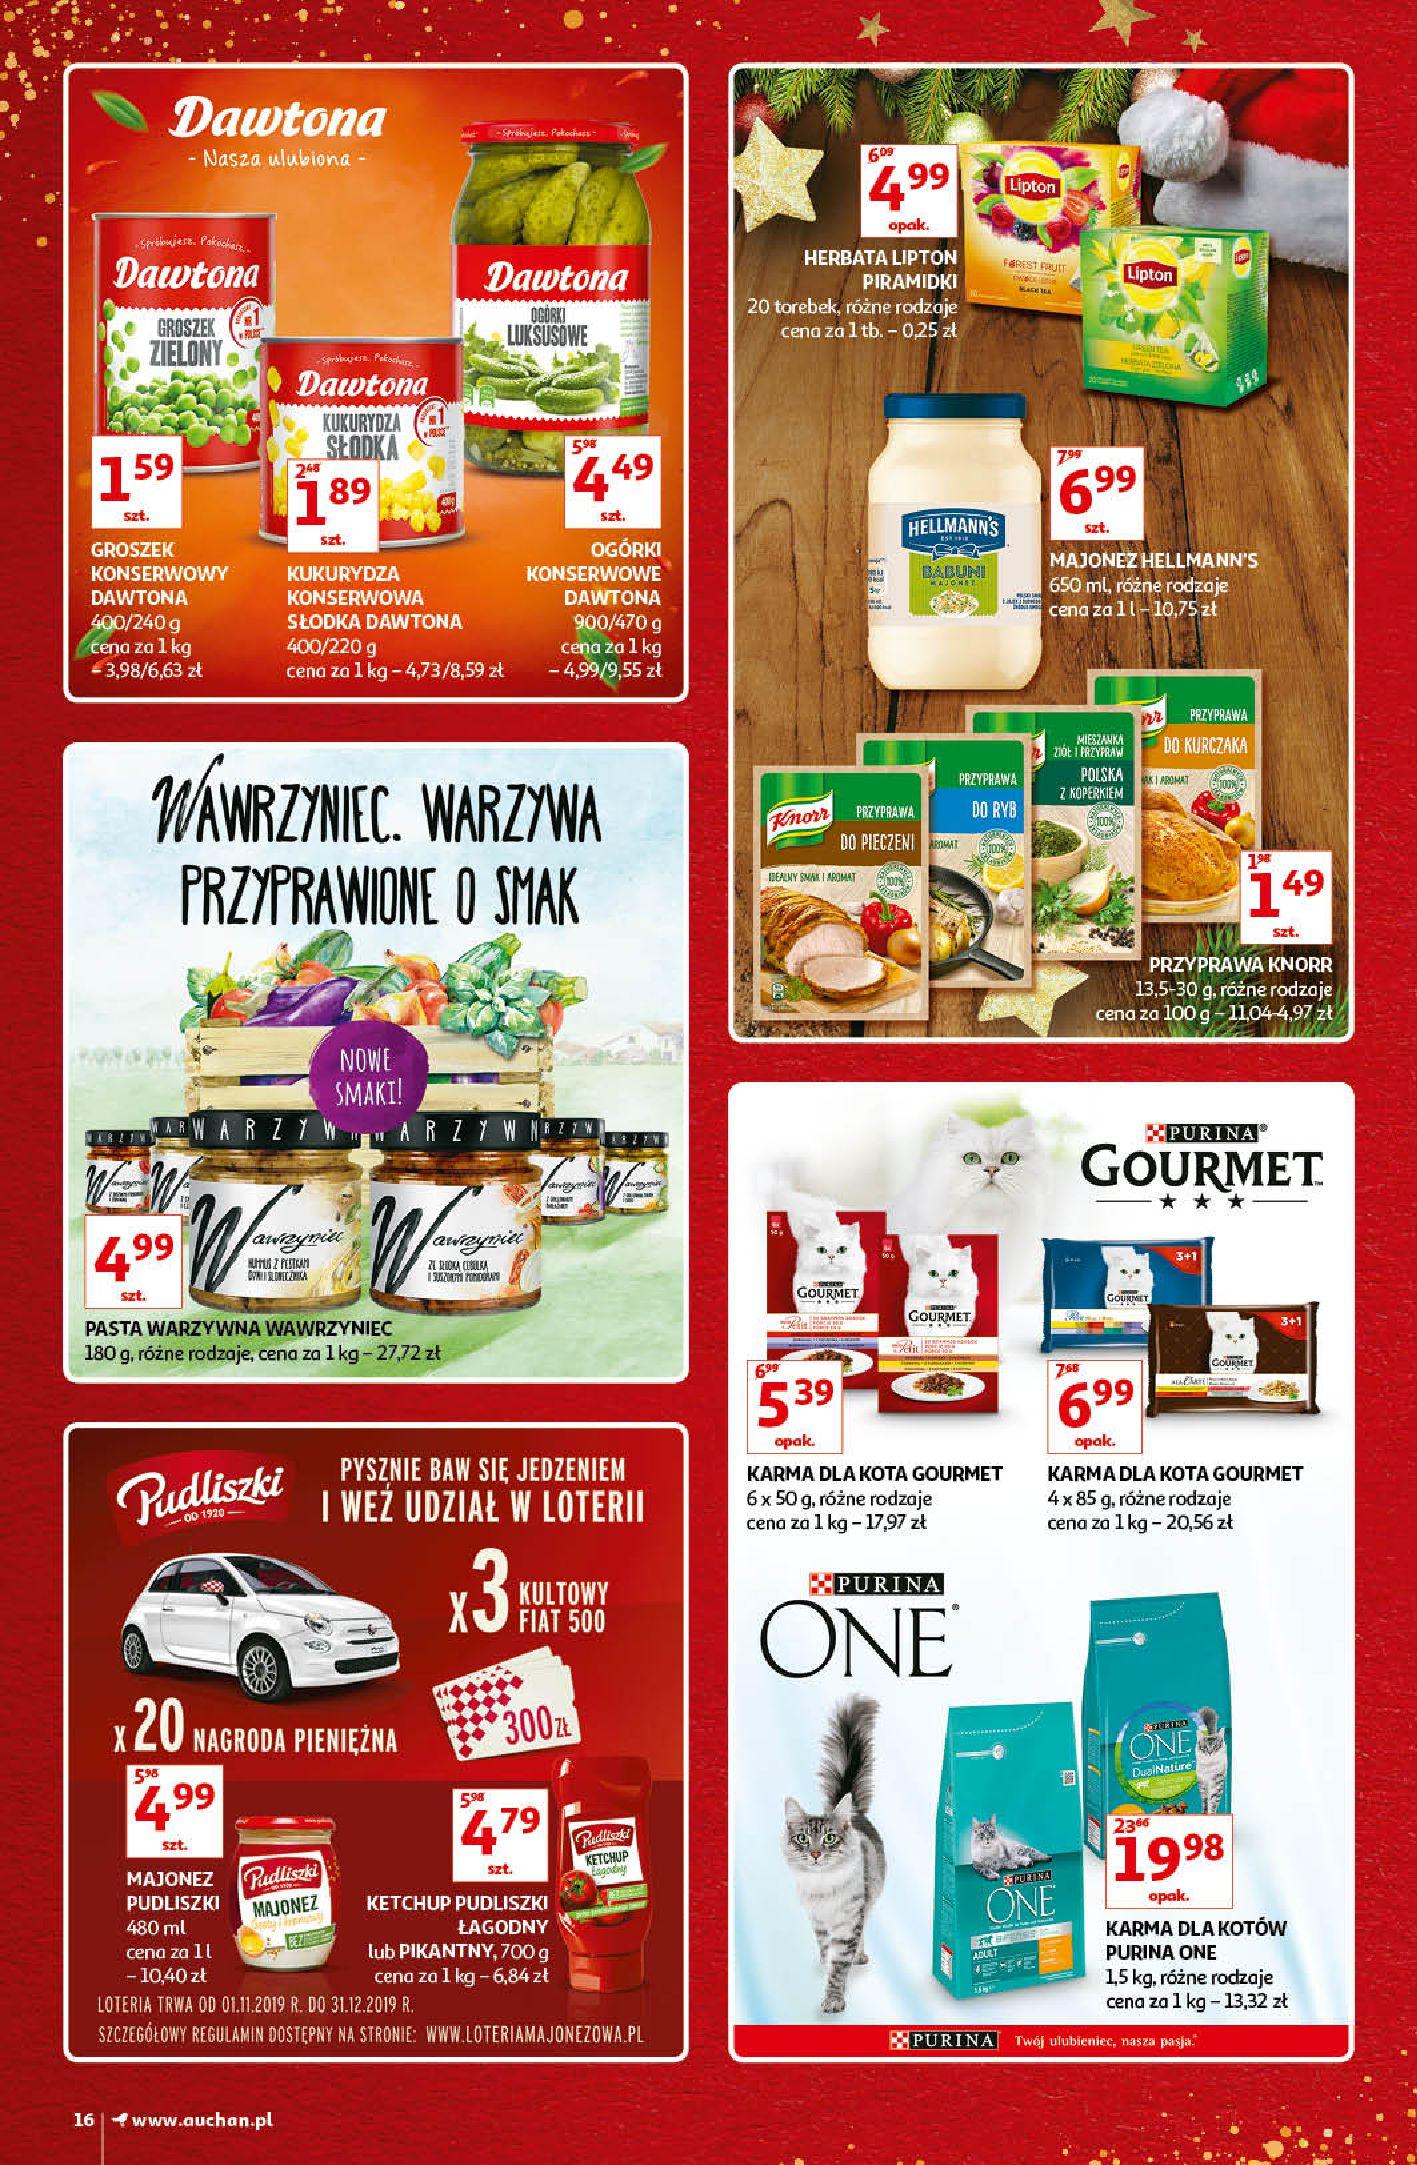 Gazetka Auchan - Kultowe Marki Hipermarkety-04.12.2019-15.12.2019-page-16